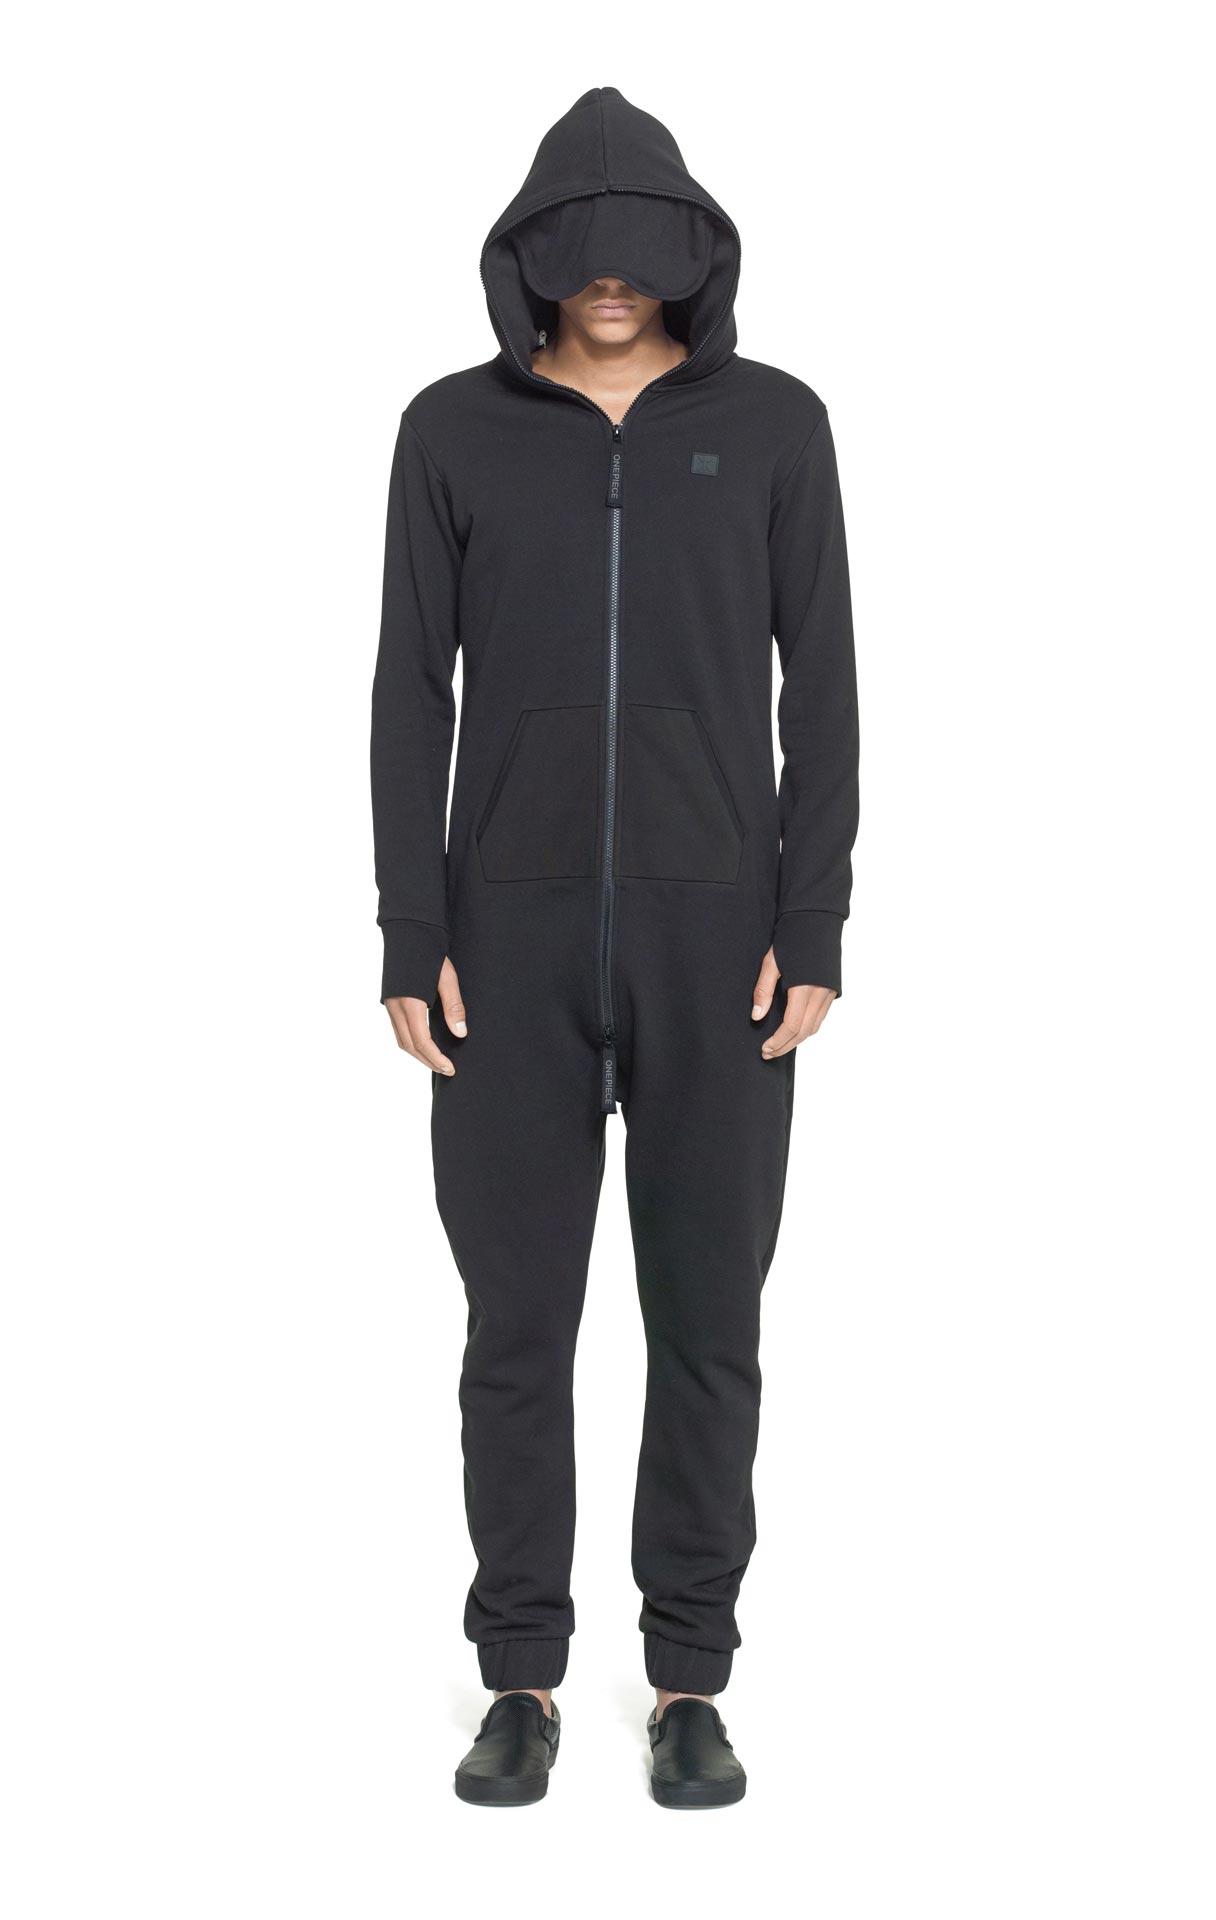 Onepiece: Stealth Jumpsuit